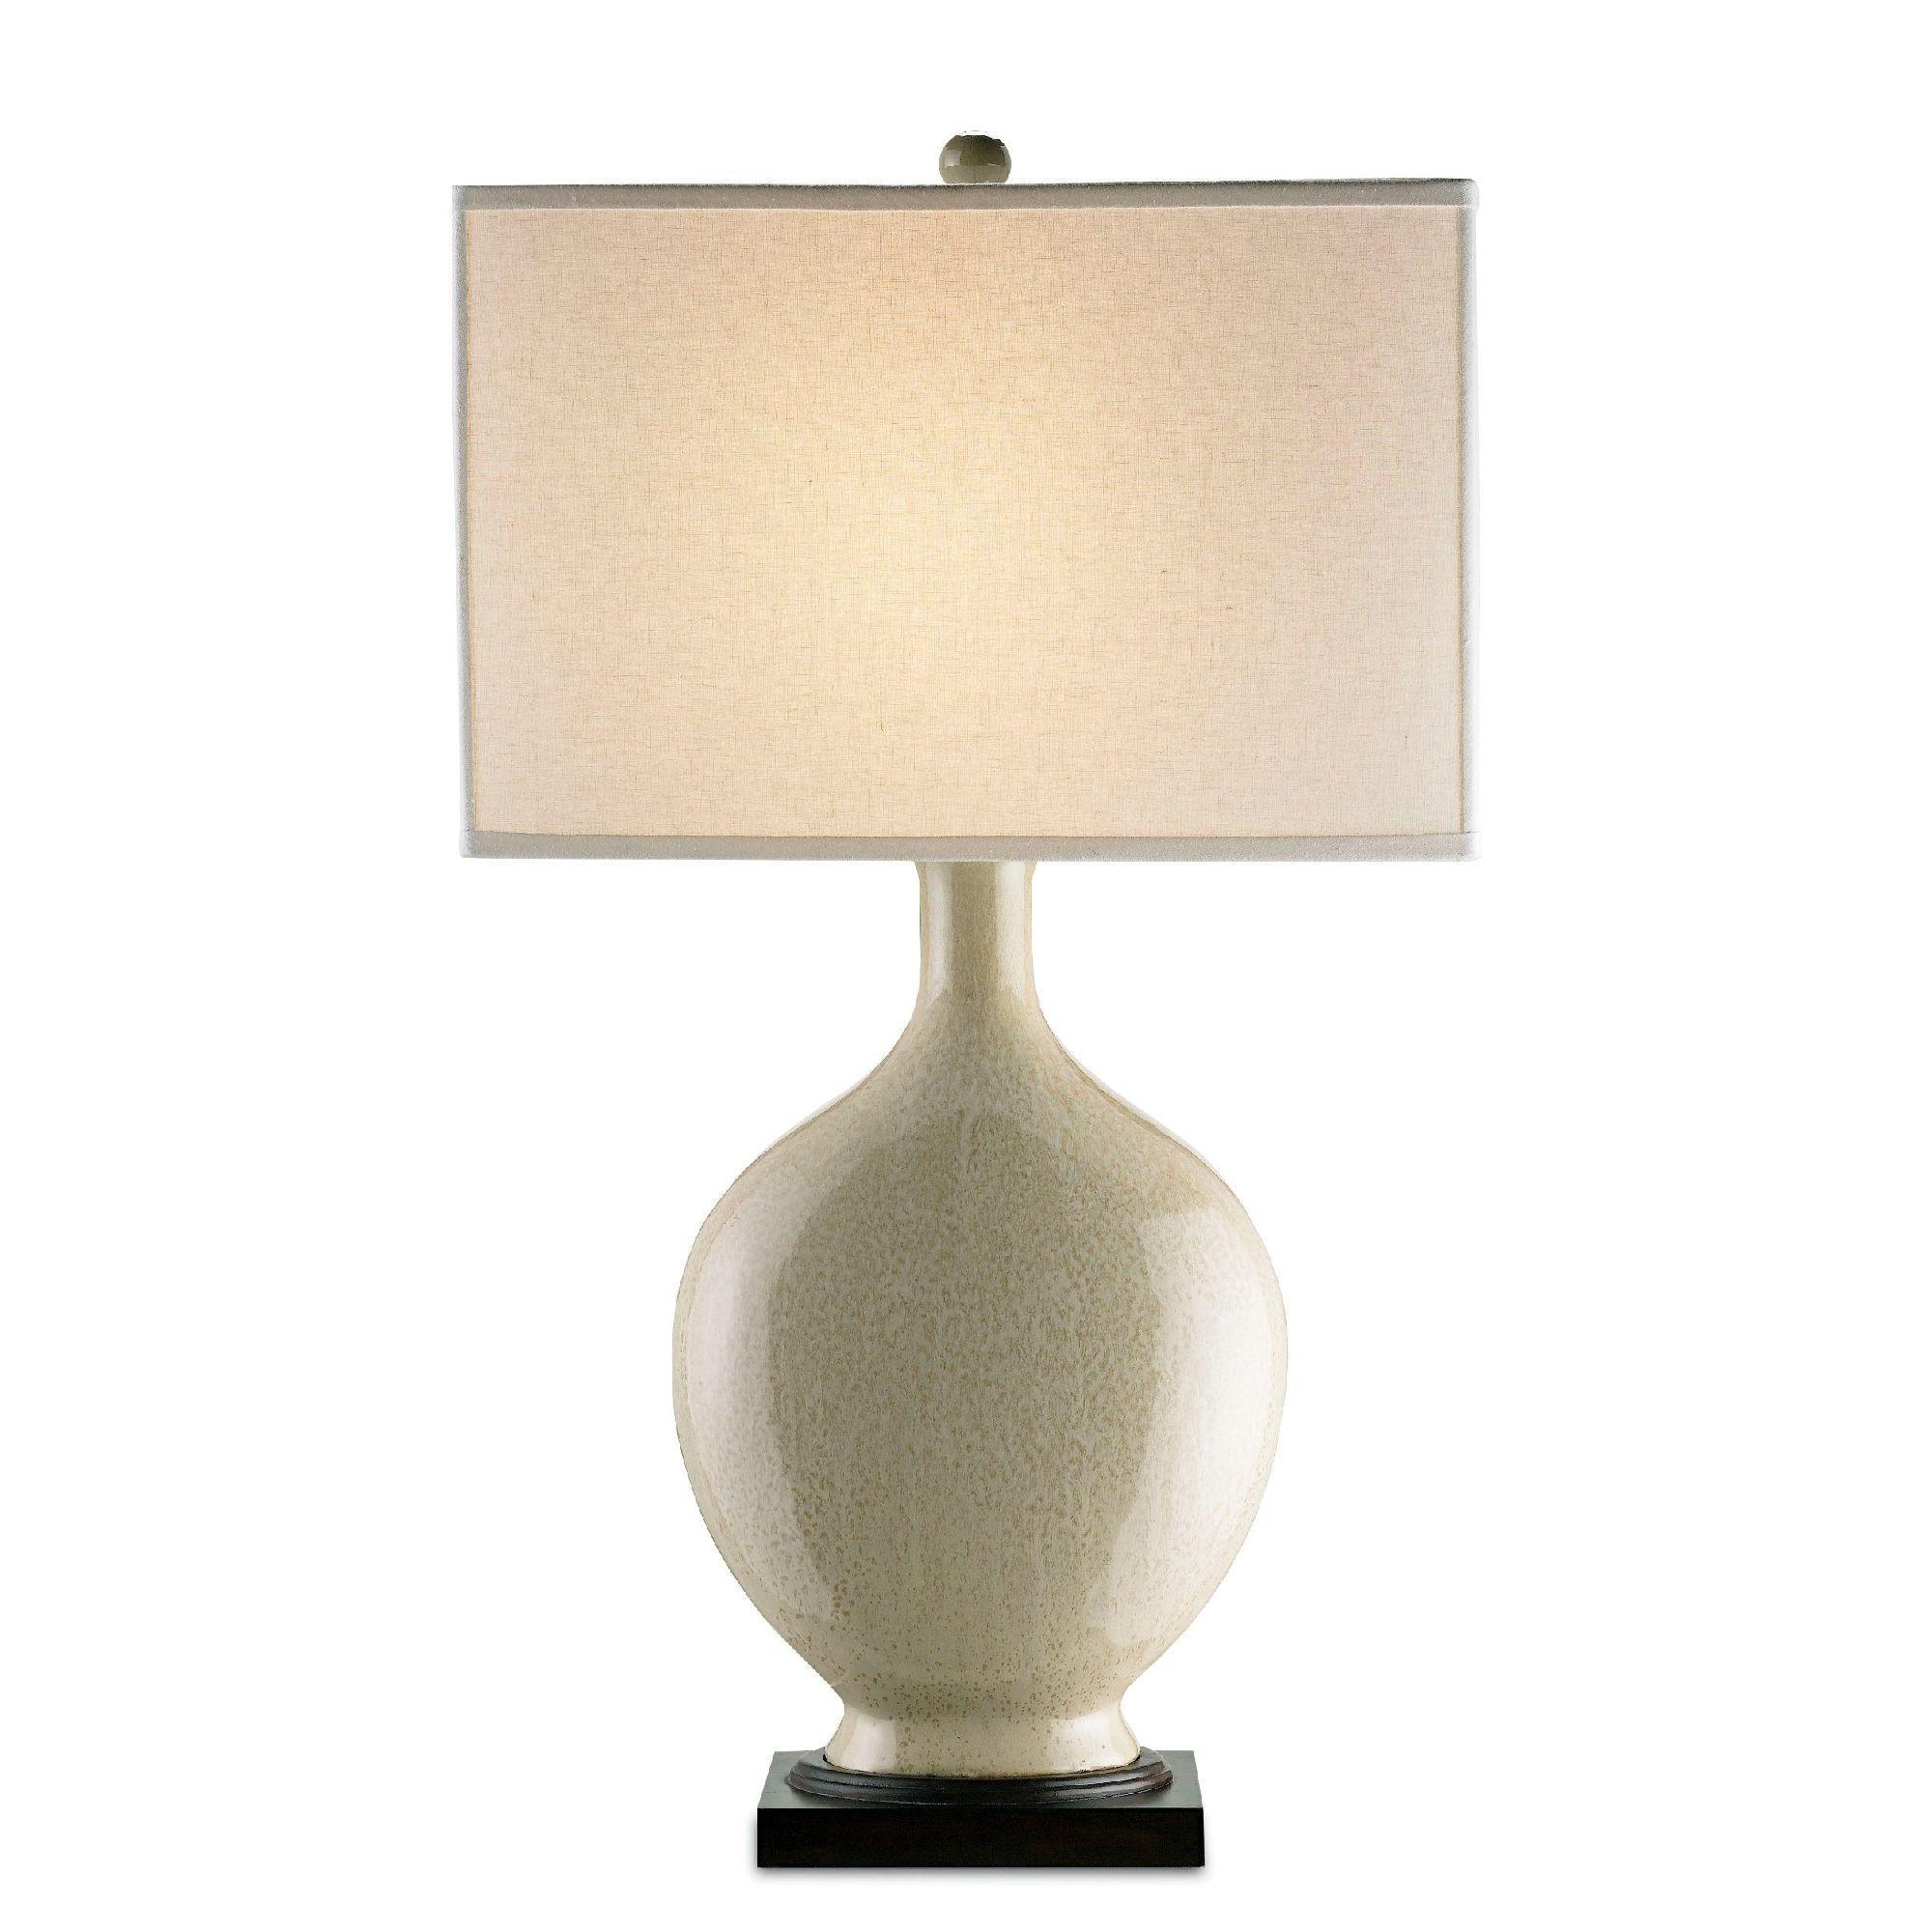 cool lamp ideas photo - 4